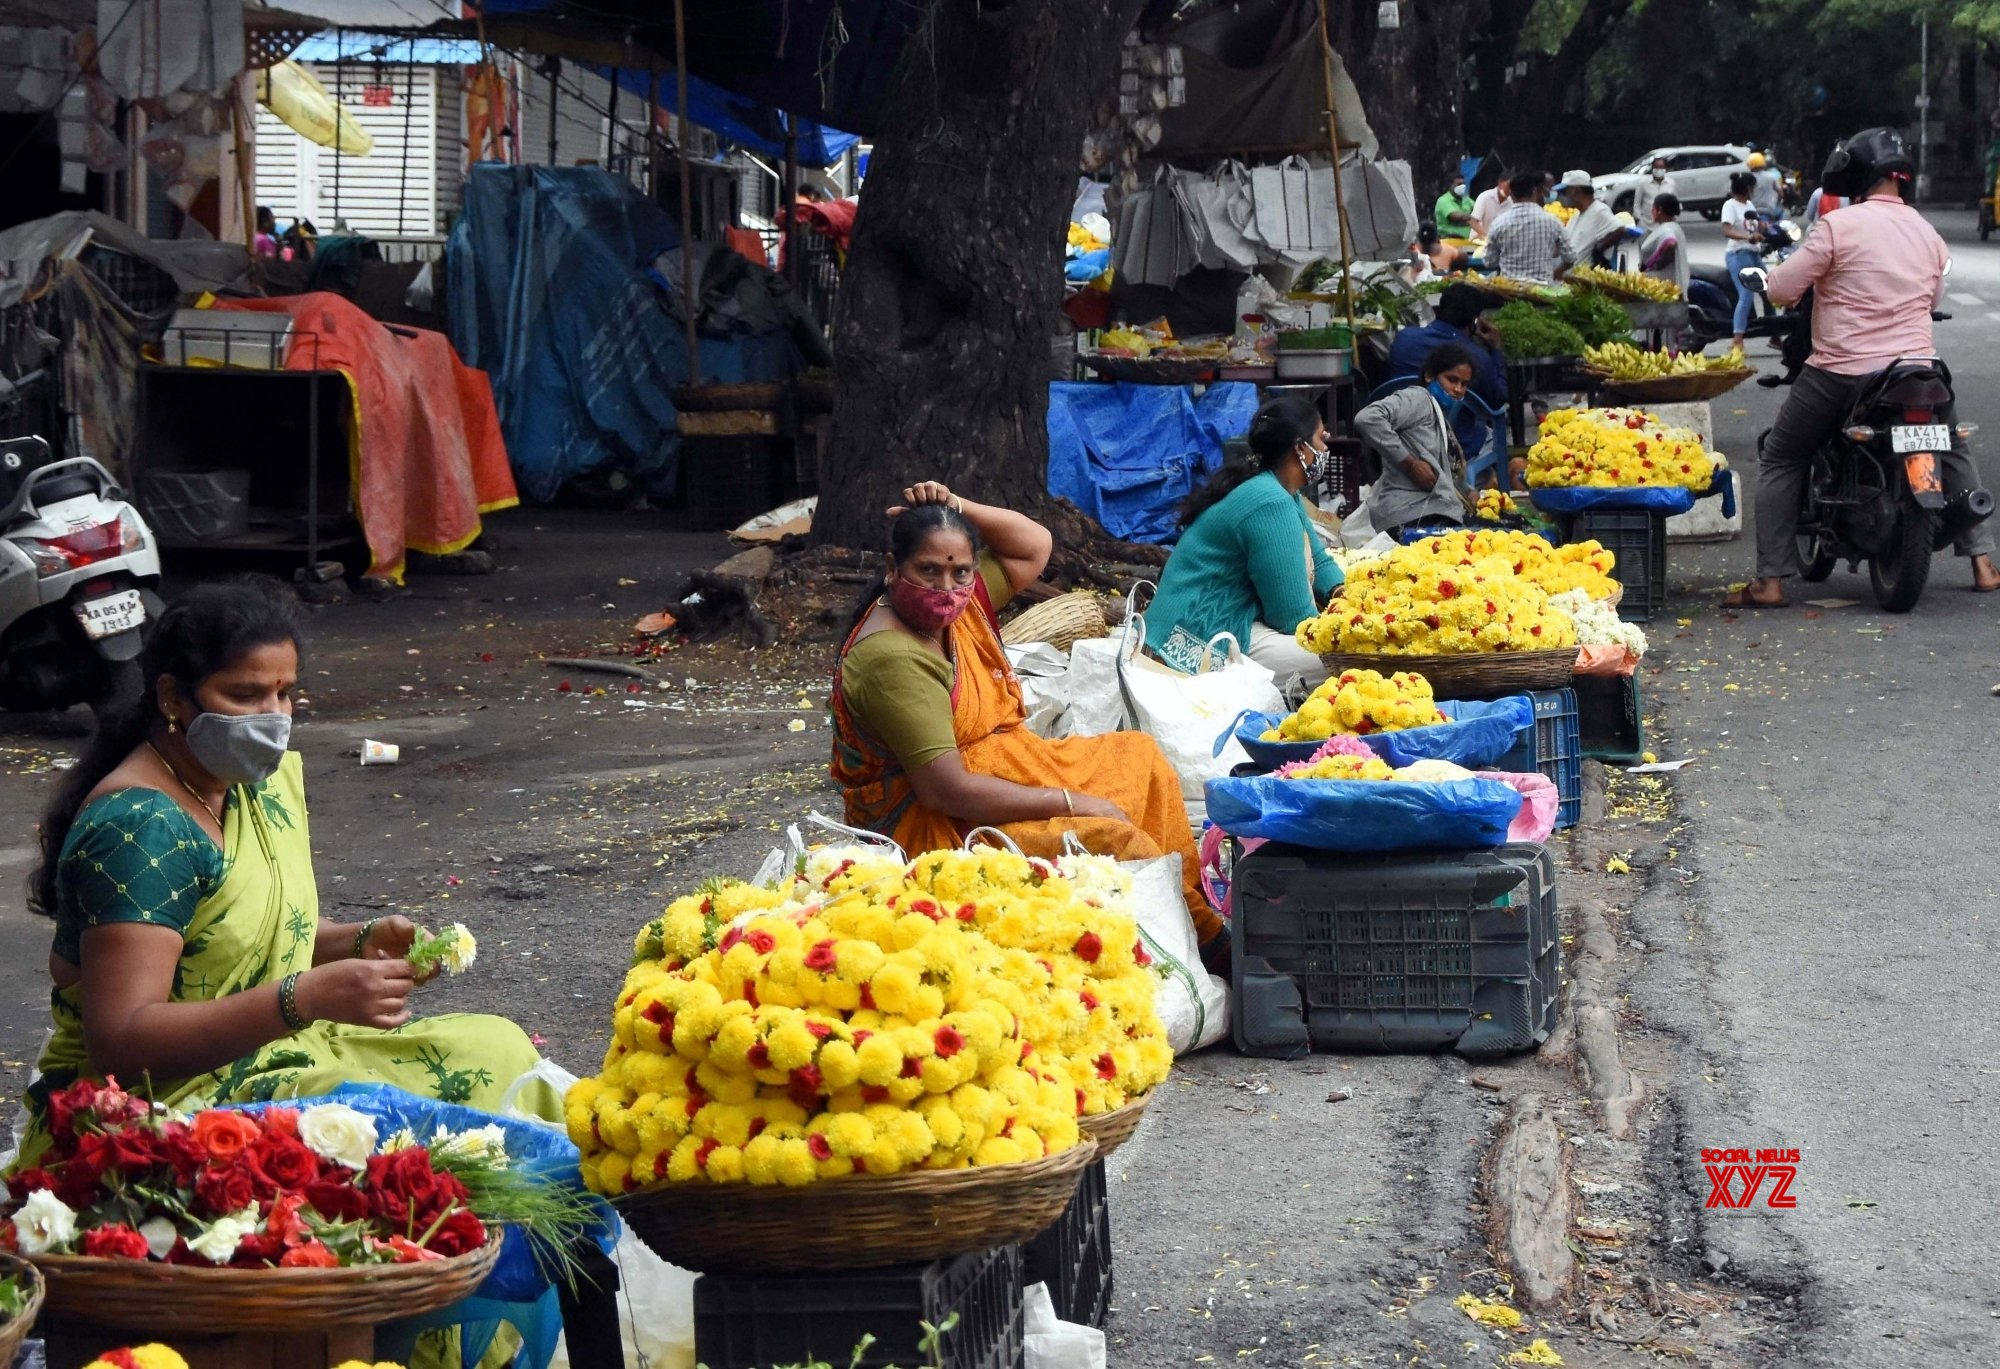 Bengaluru : Flower vendors waiting for the customers at Gandhi Bazaar during Coronavirus lockdown in the wake of the 2nd wave of COVID - 19, in Bengaluru. #Gallery